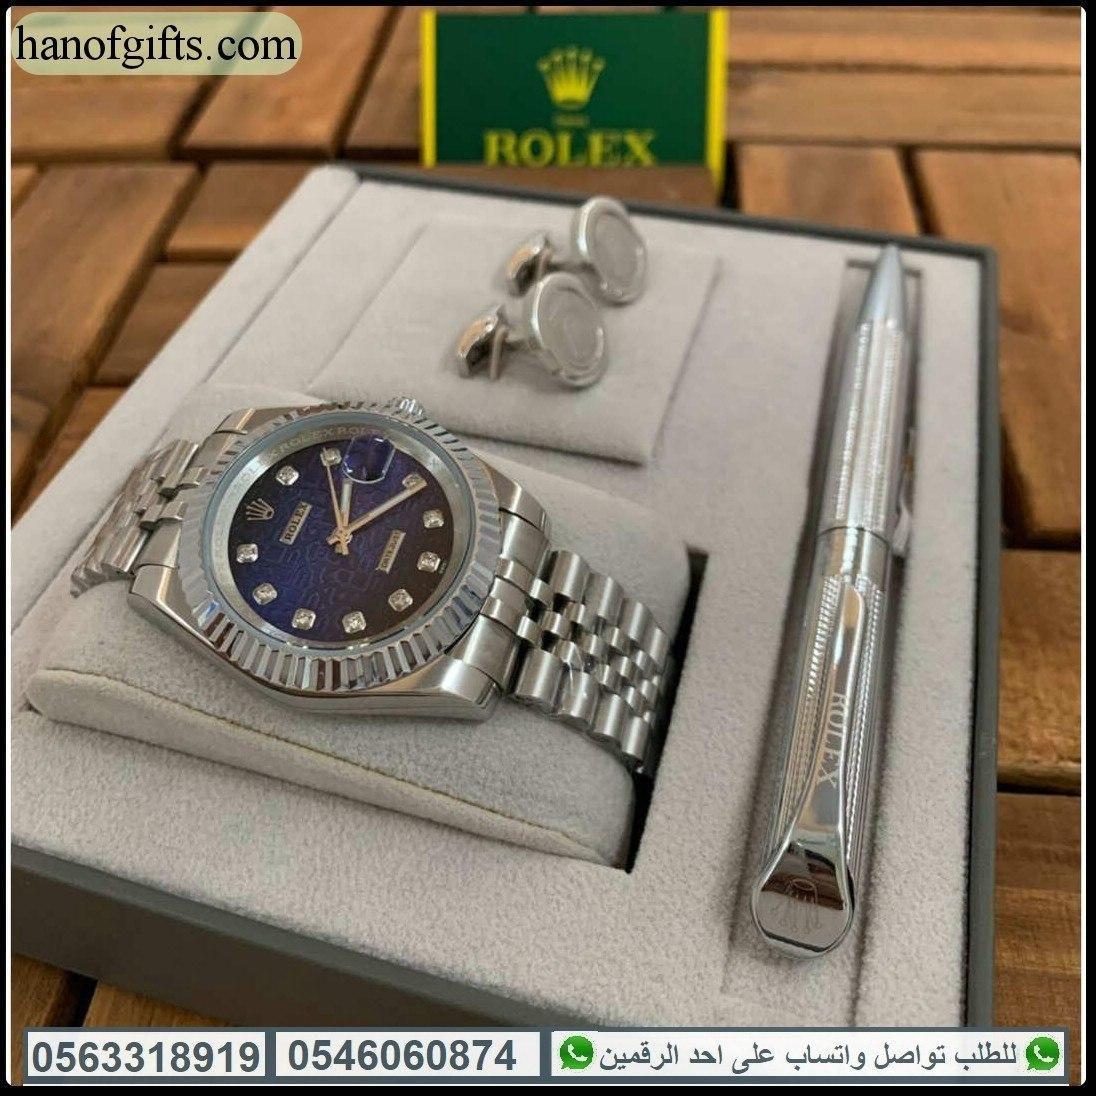 ساعات Rolex رجالية طقم فخم ساعة رولكس مع قلم وكبك رولكس هدايا هنوف Kors Watches Michael Kors Watch Rolex